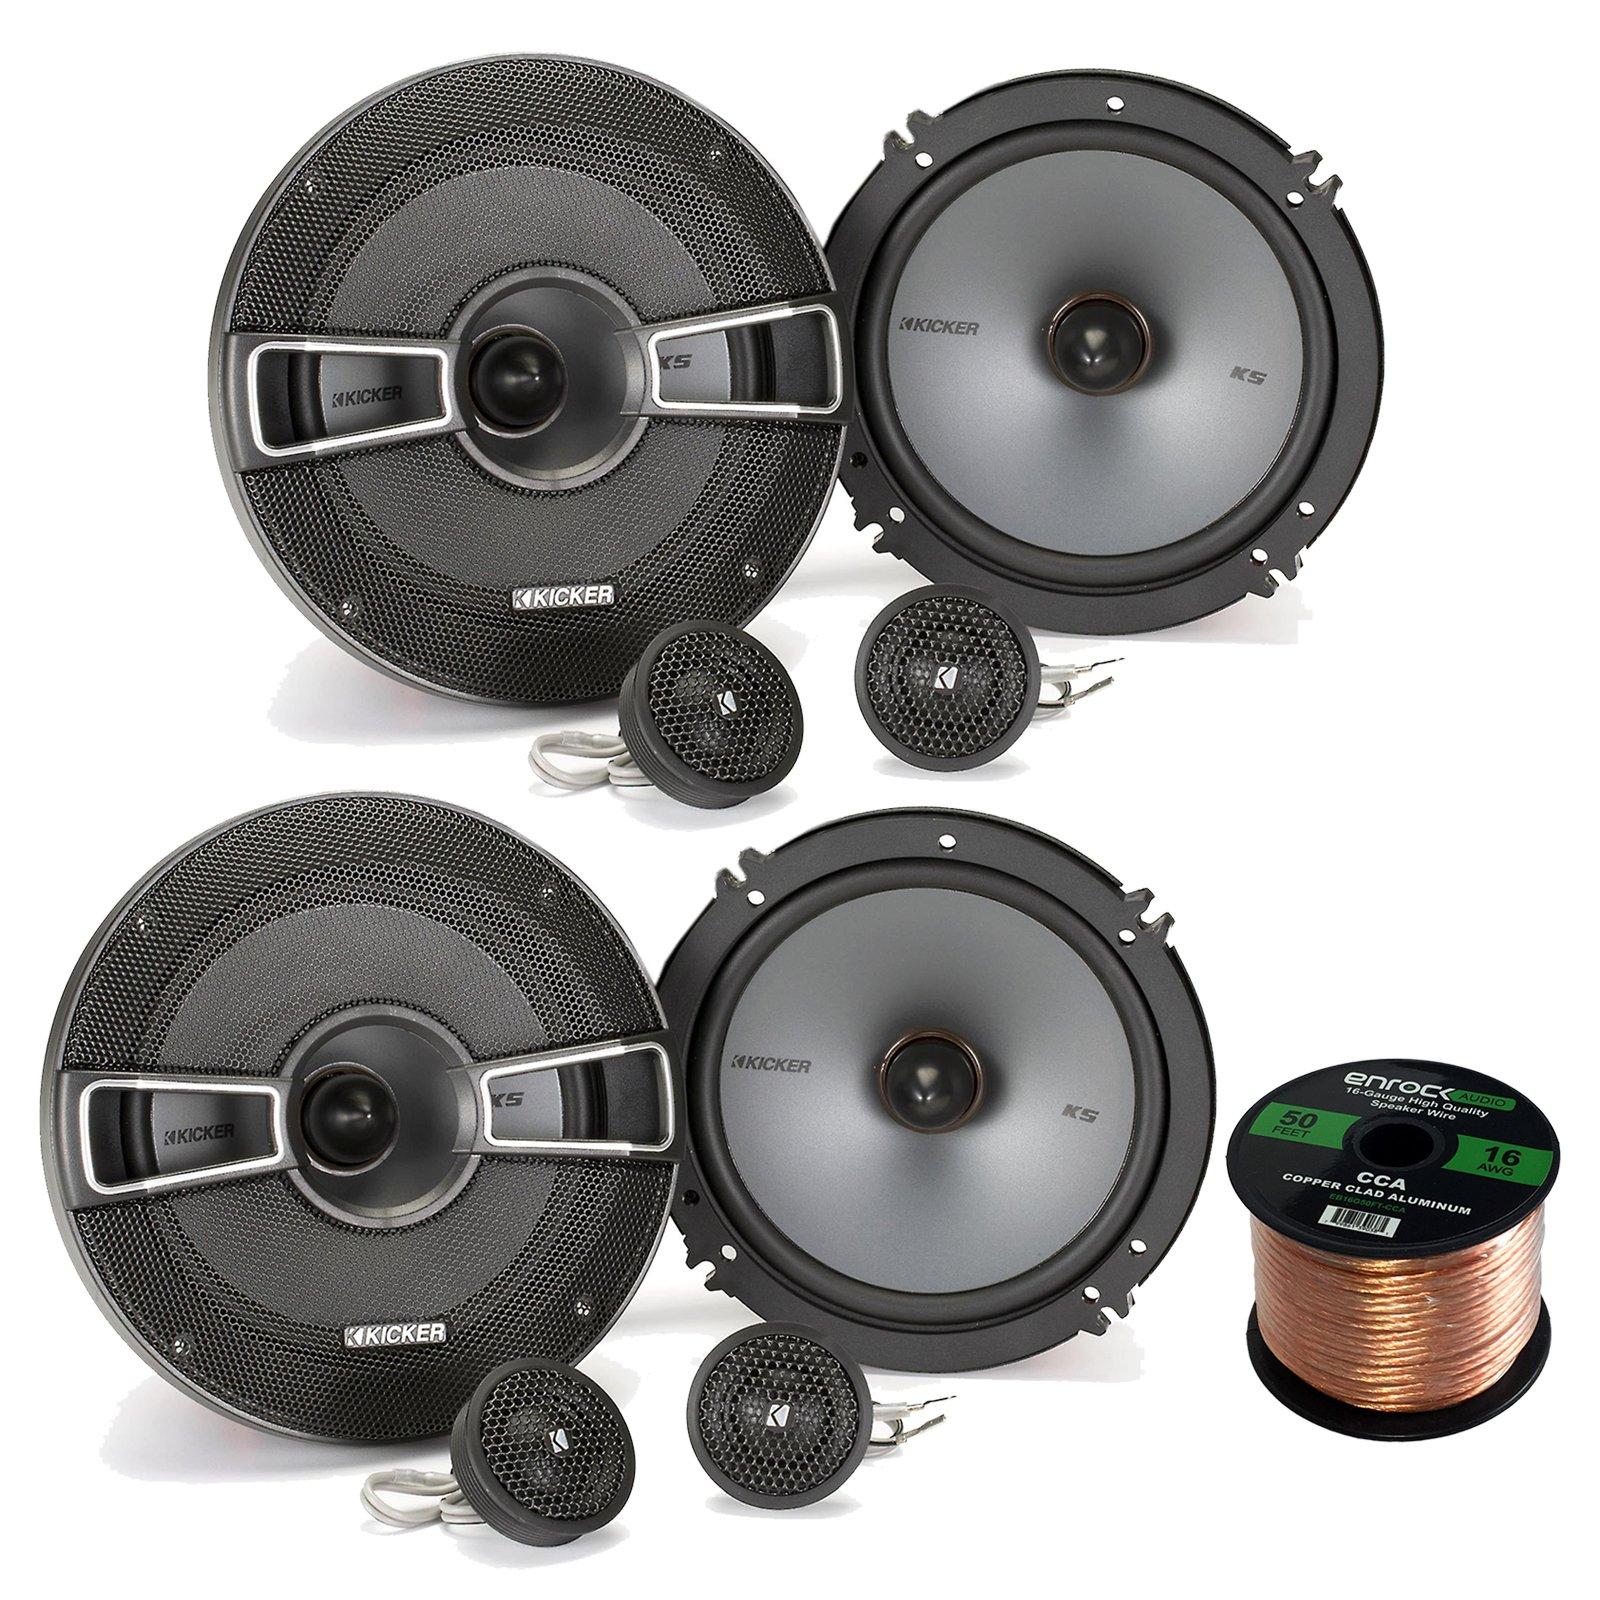 Car Speaker Set Combo Of 4x Kicker 40CS654 6.5'' 600-Watt 2-Way CS Series Car Audio Stereo Speakers + Enrock 50ft 16g Speaker Wire